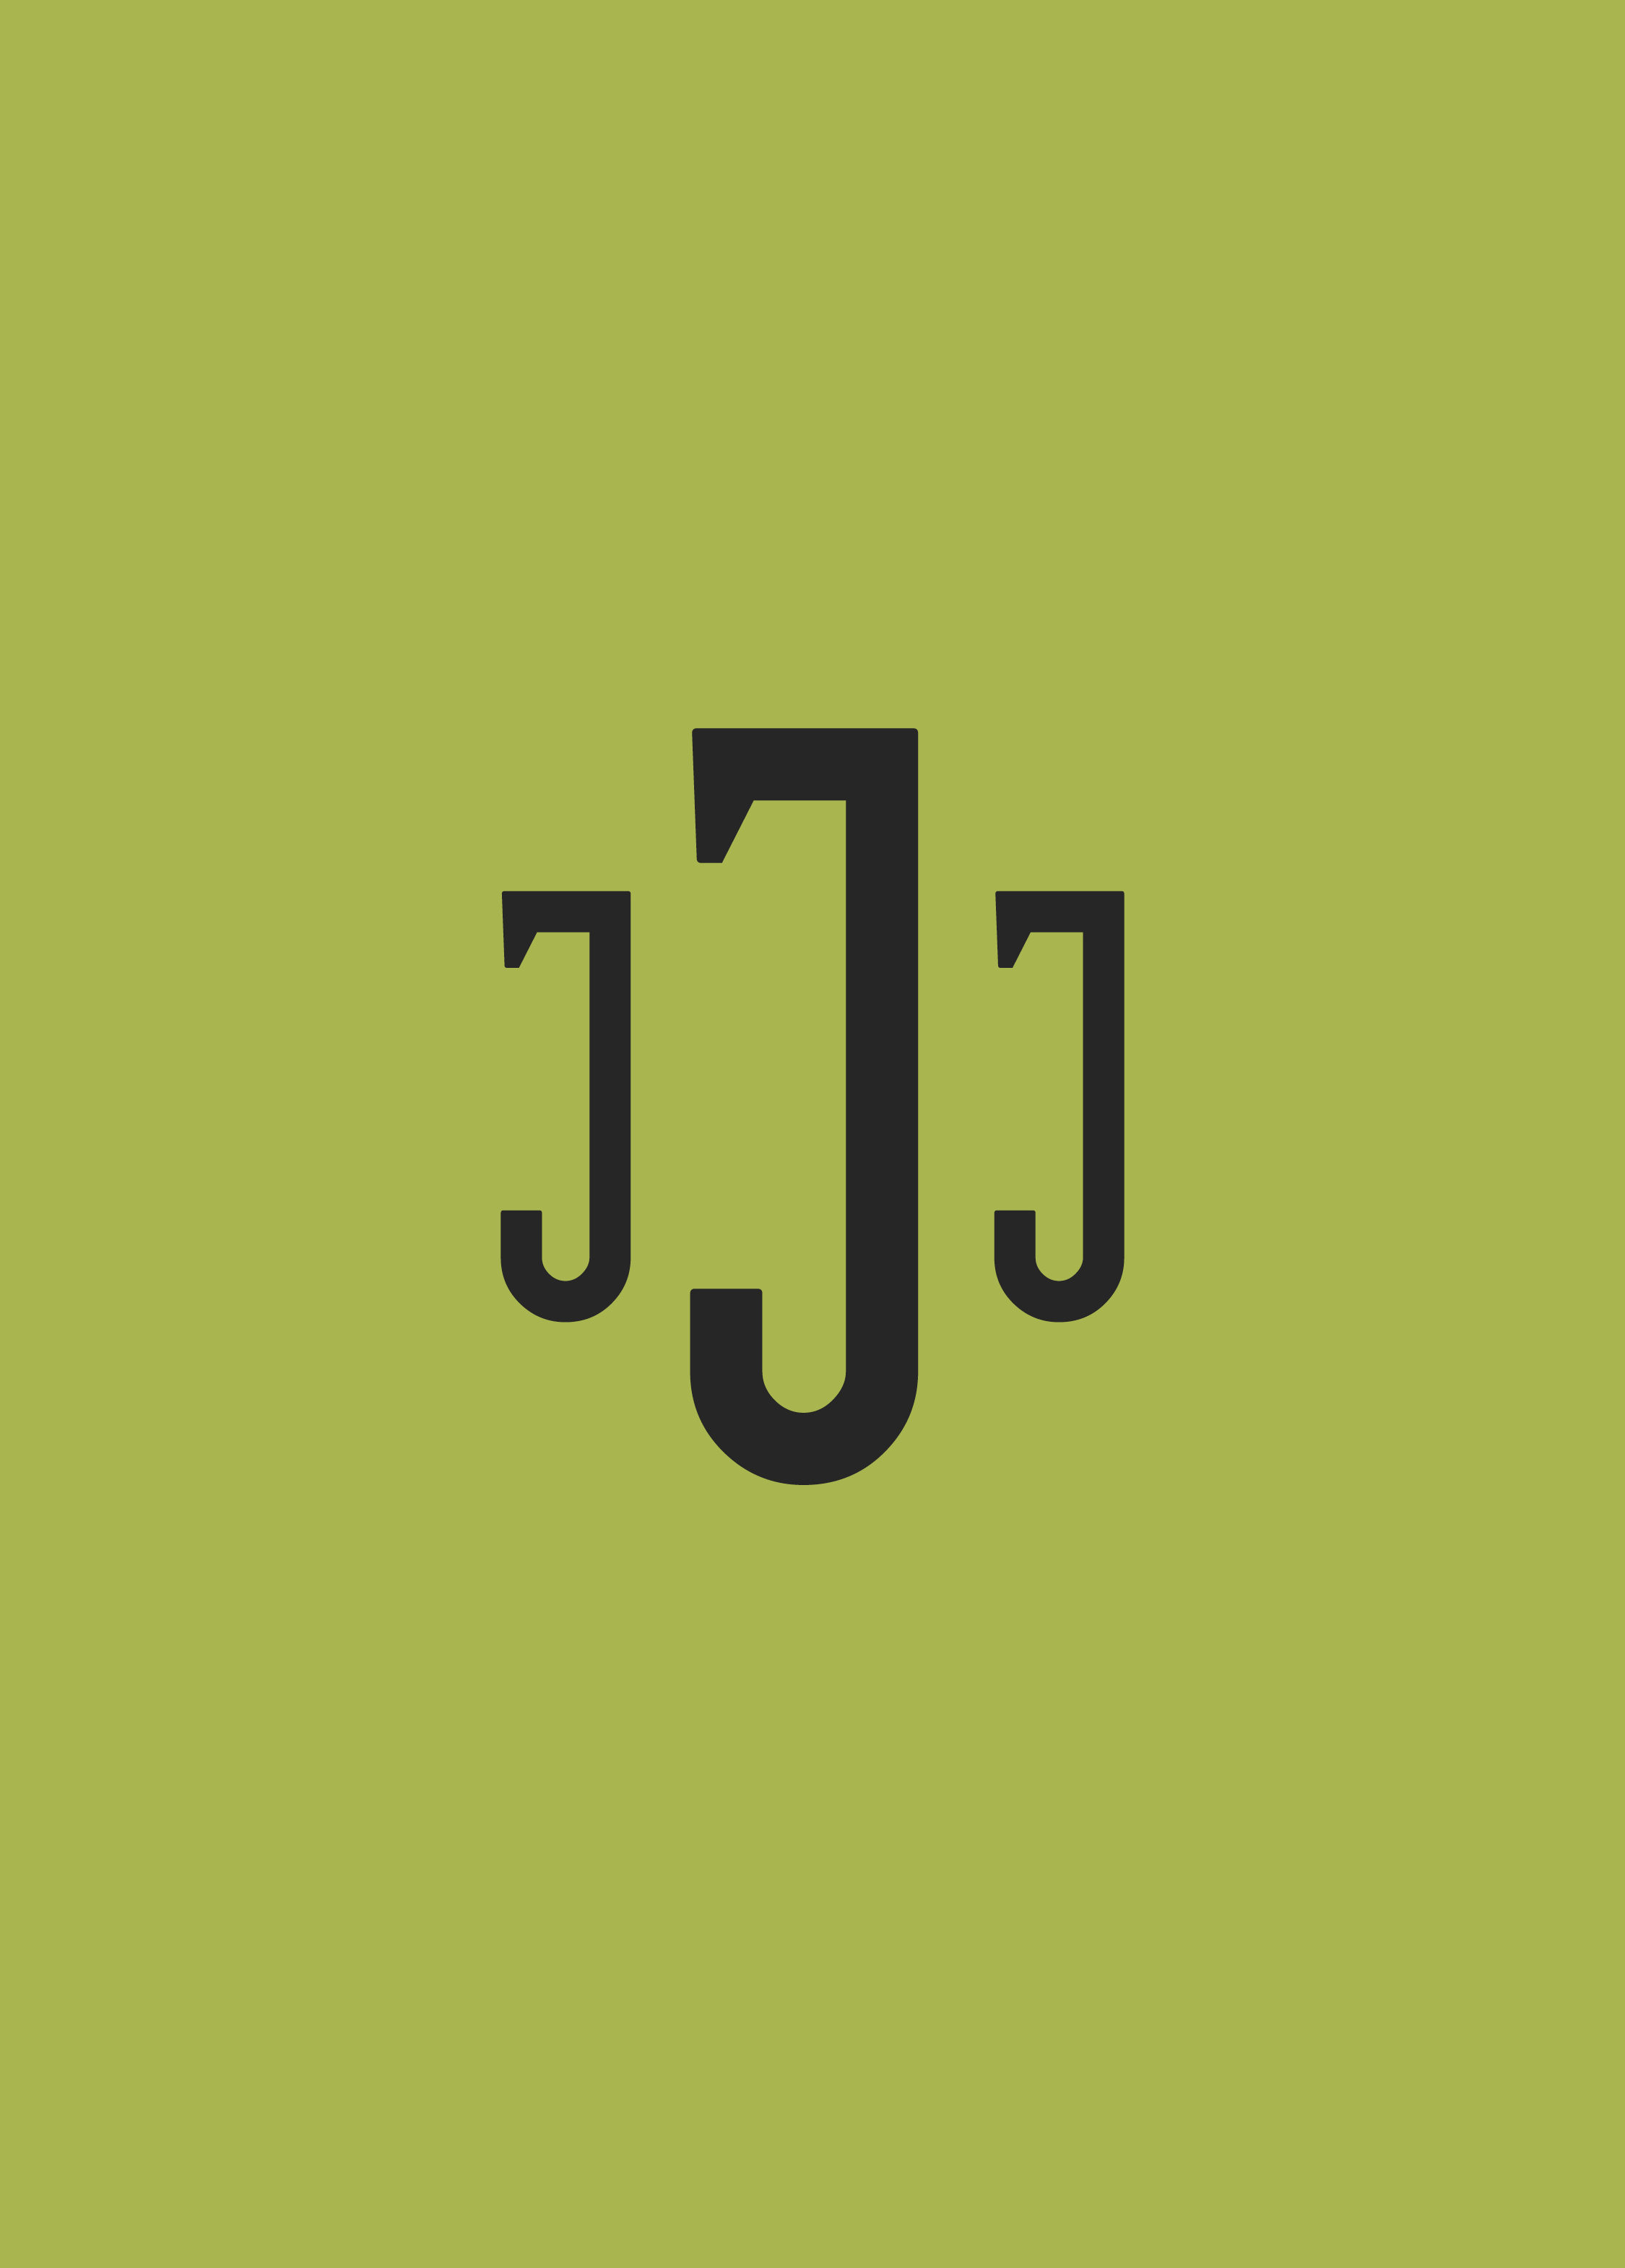 Triple-J_JJJ